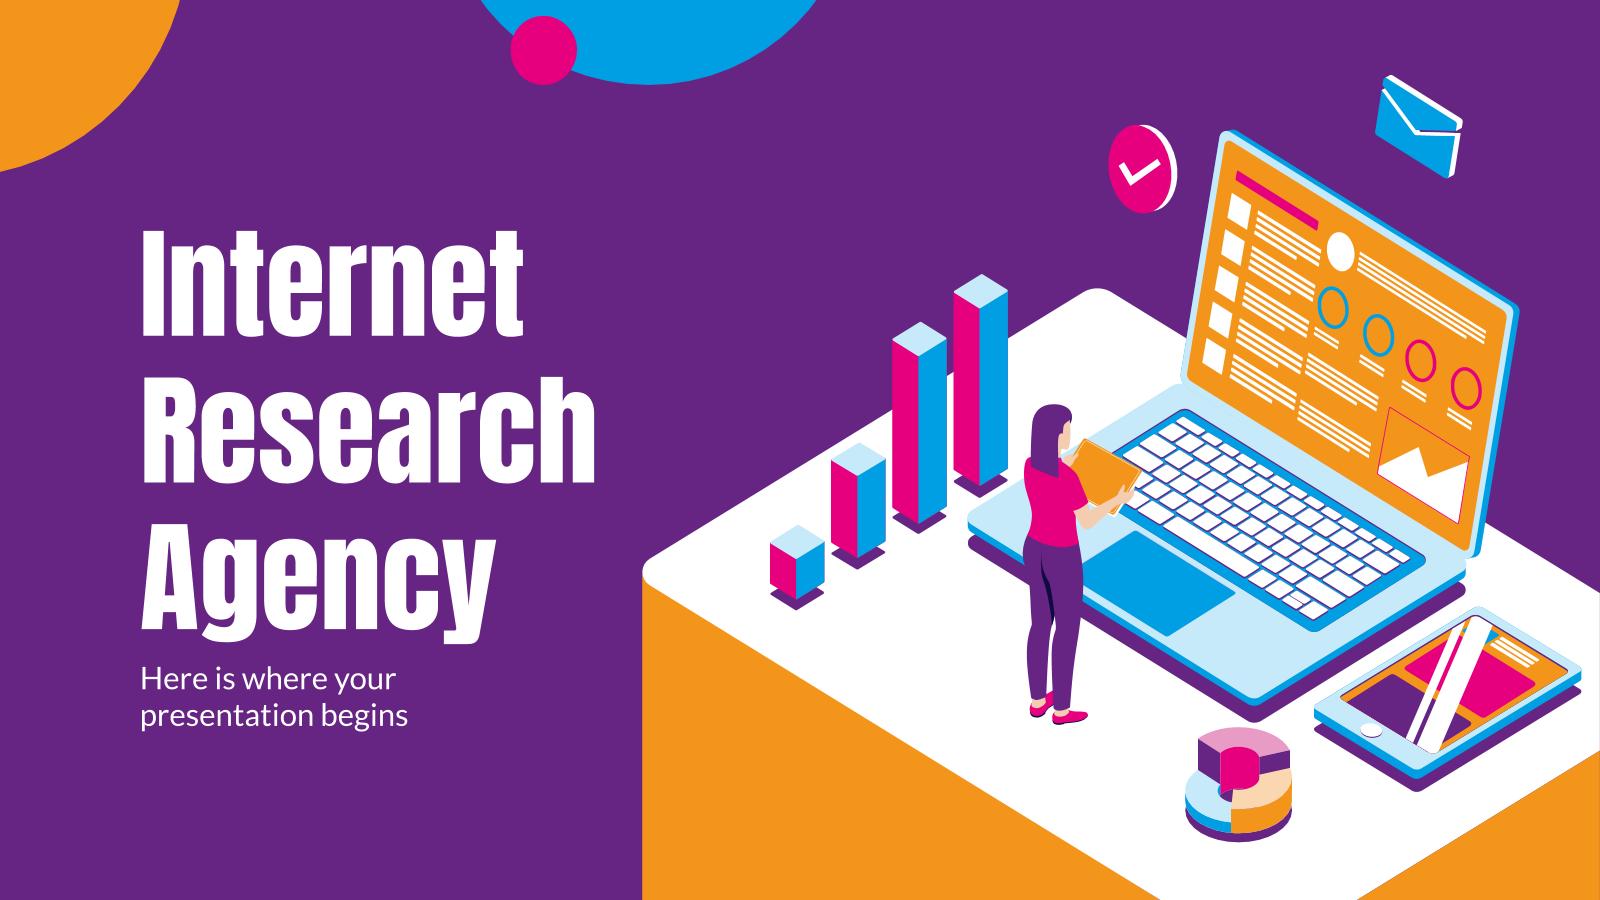 Plantilla de presentación Agencia investigación Internet